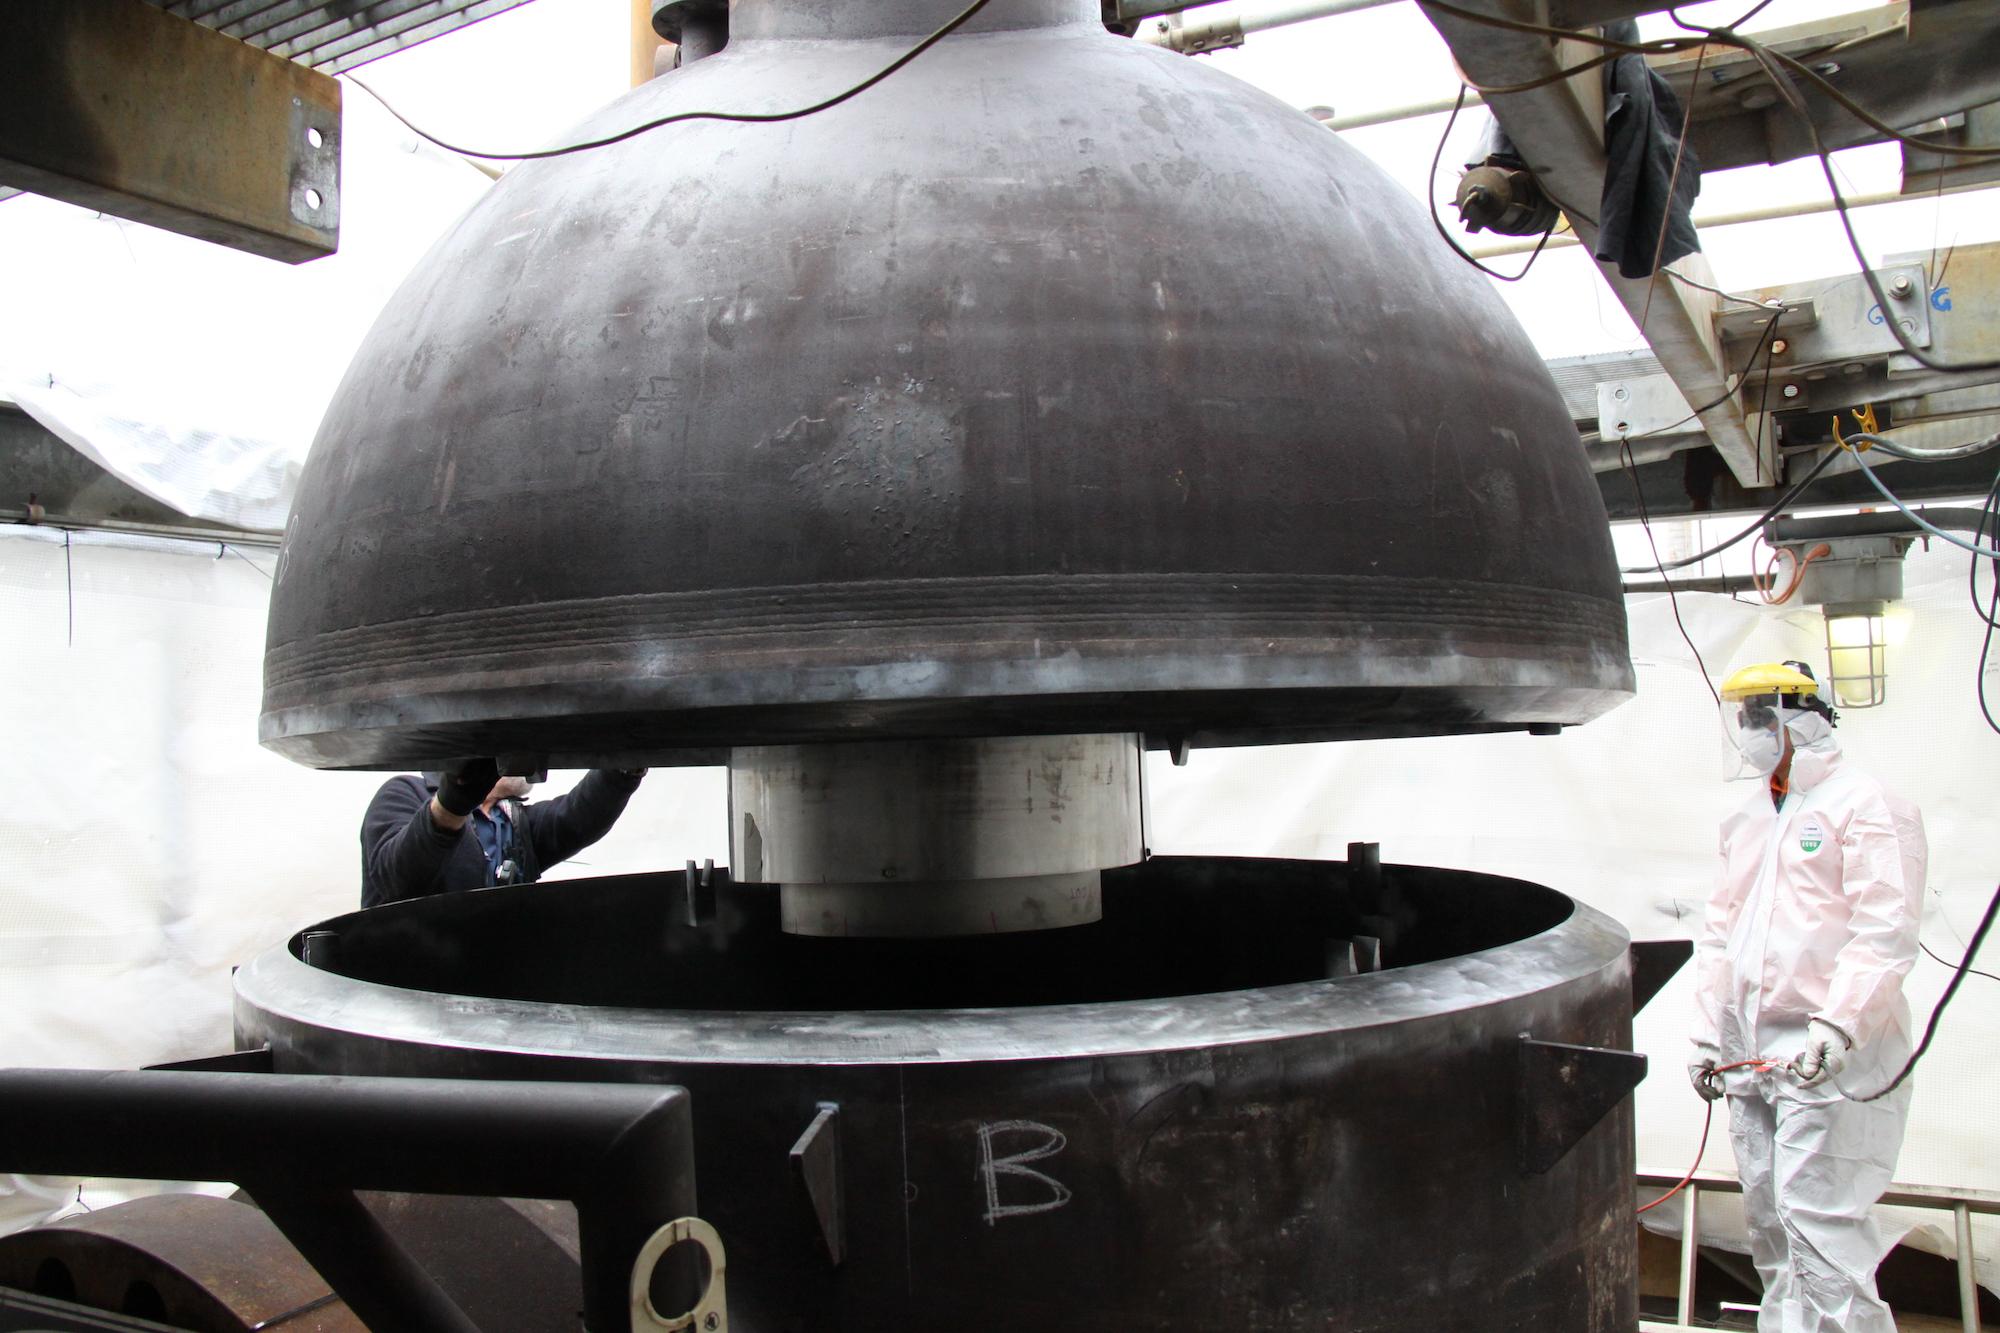 Lowering head onto shell